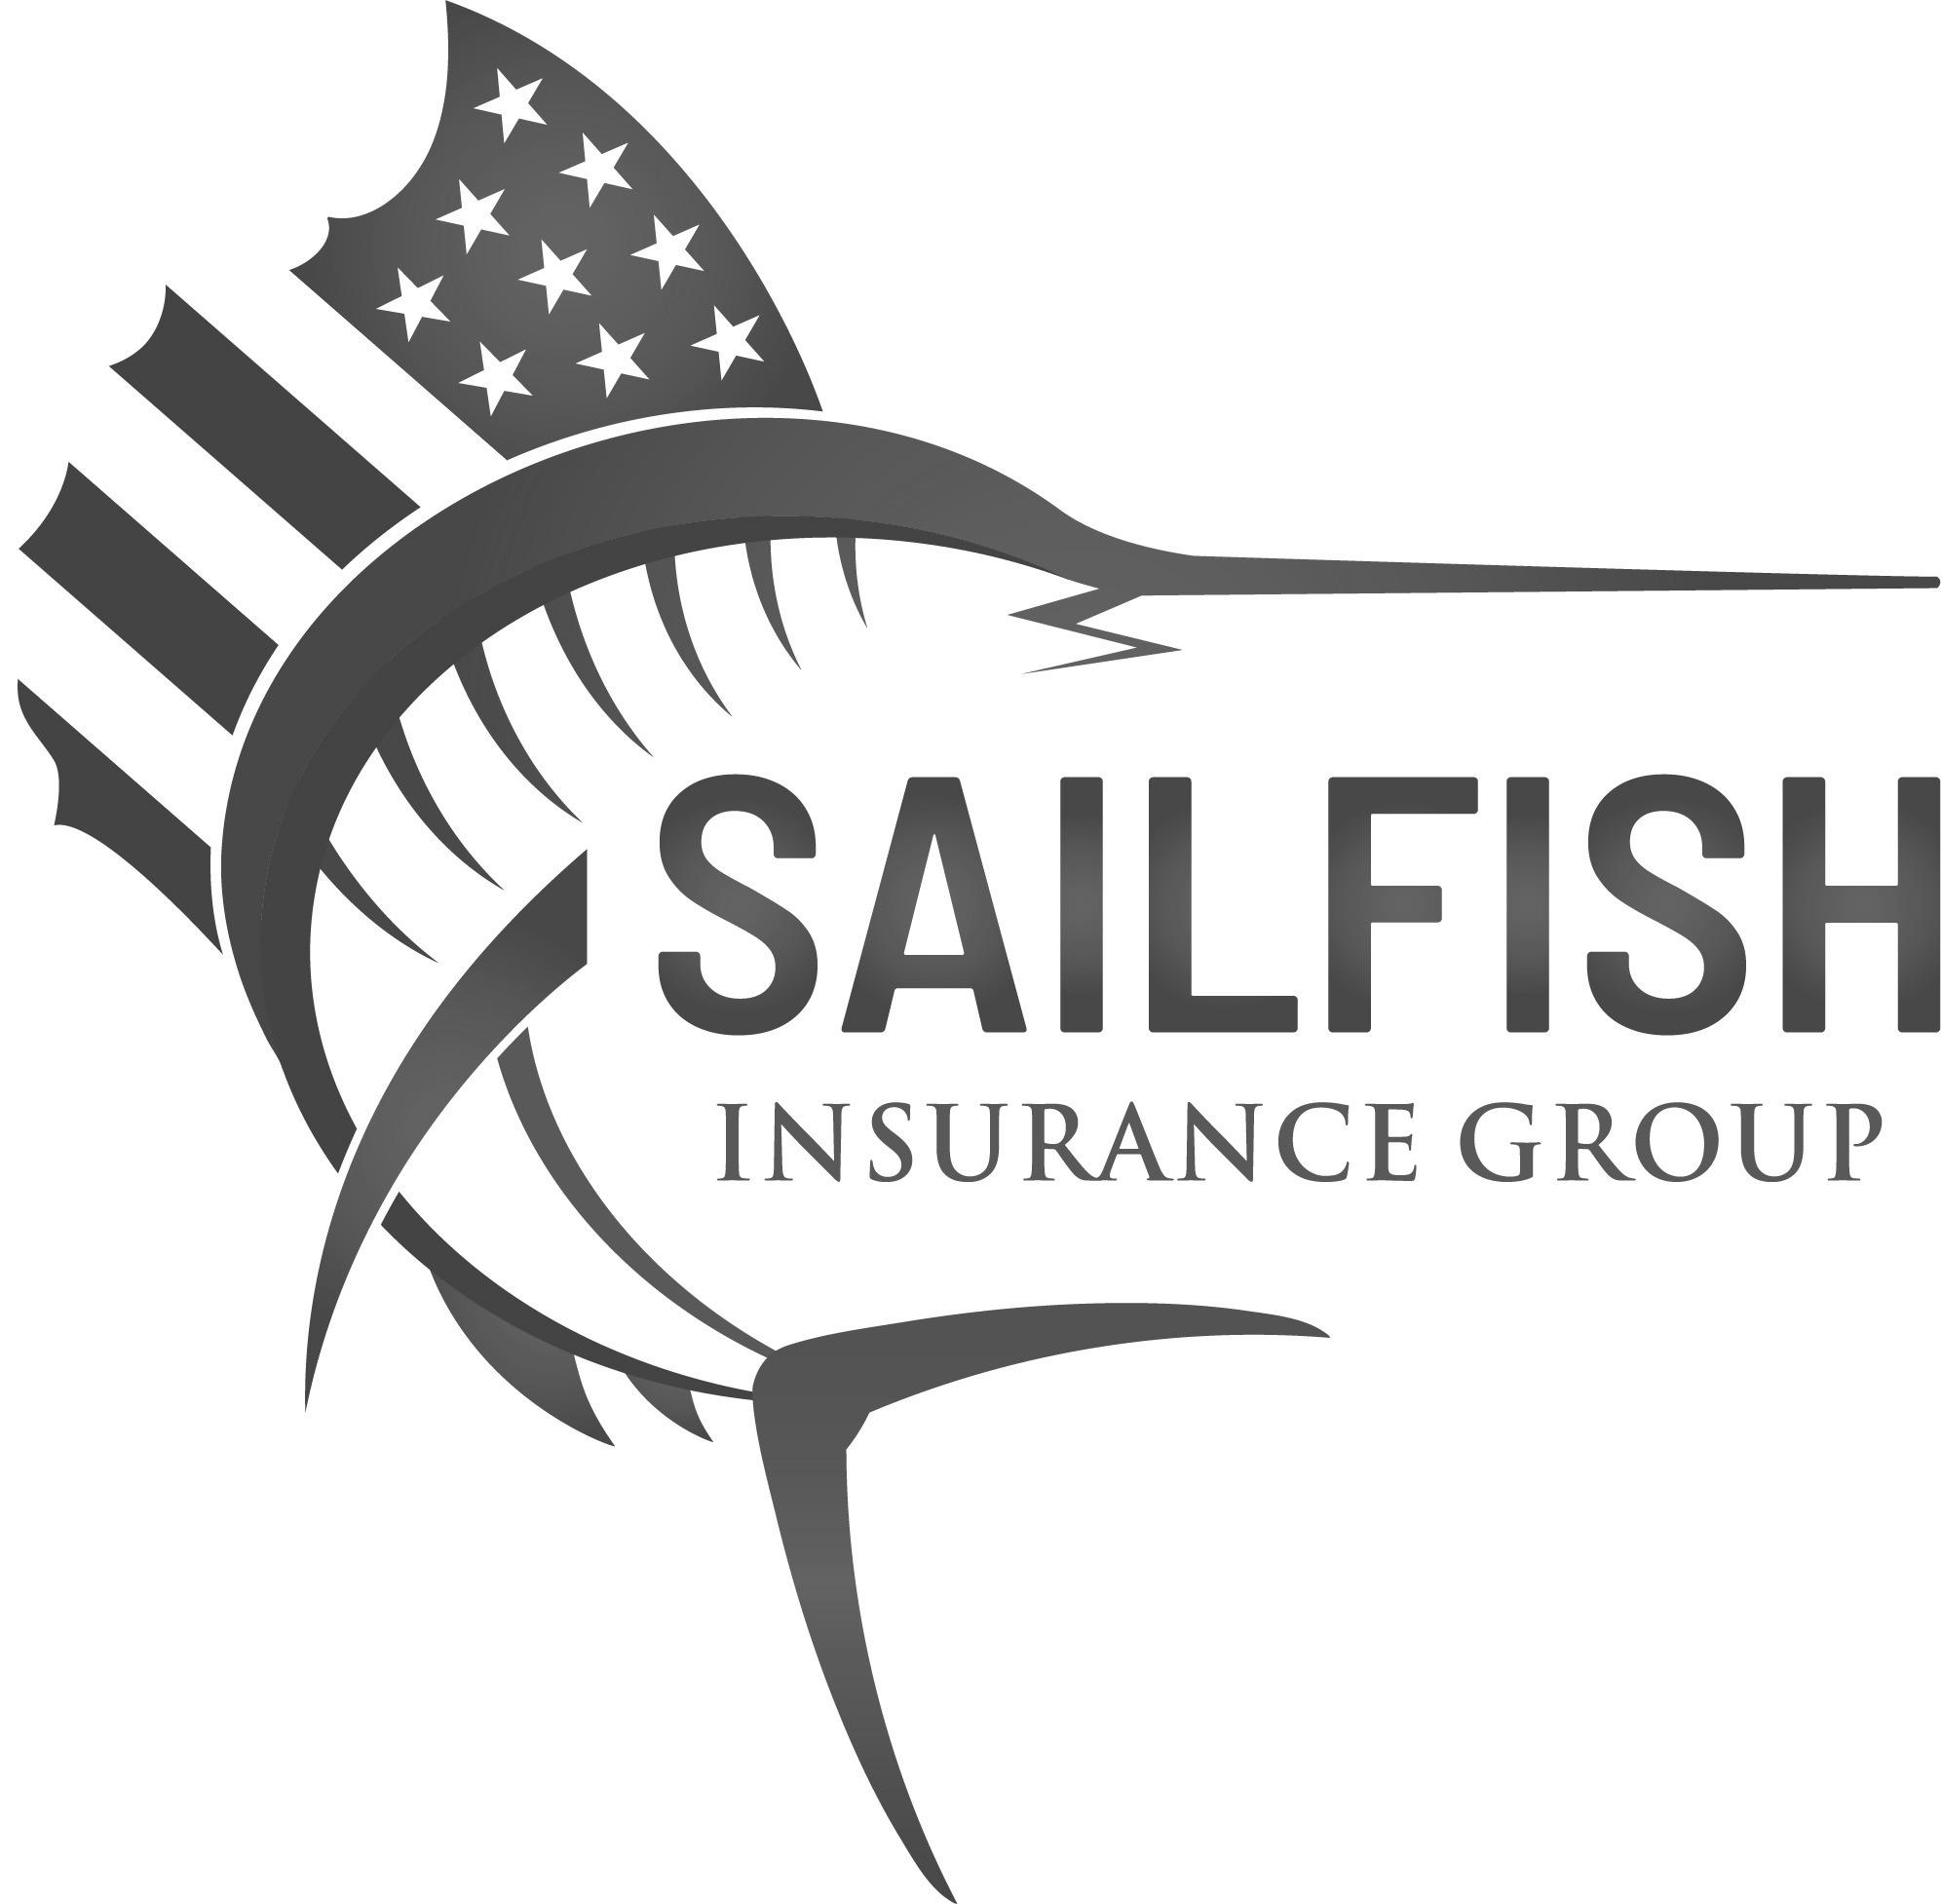 SailfishInsuranceGroup_Logo_Final_edited